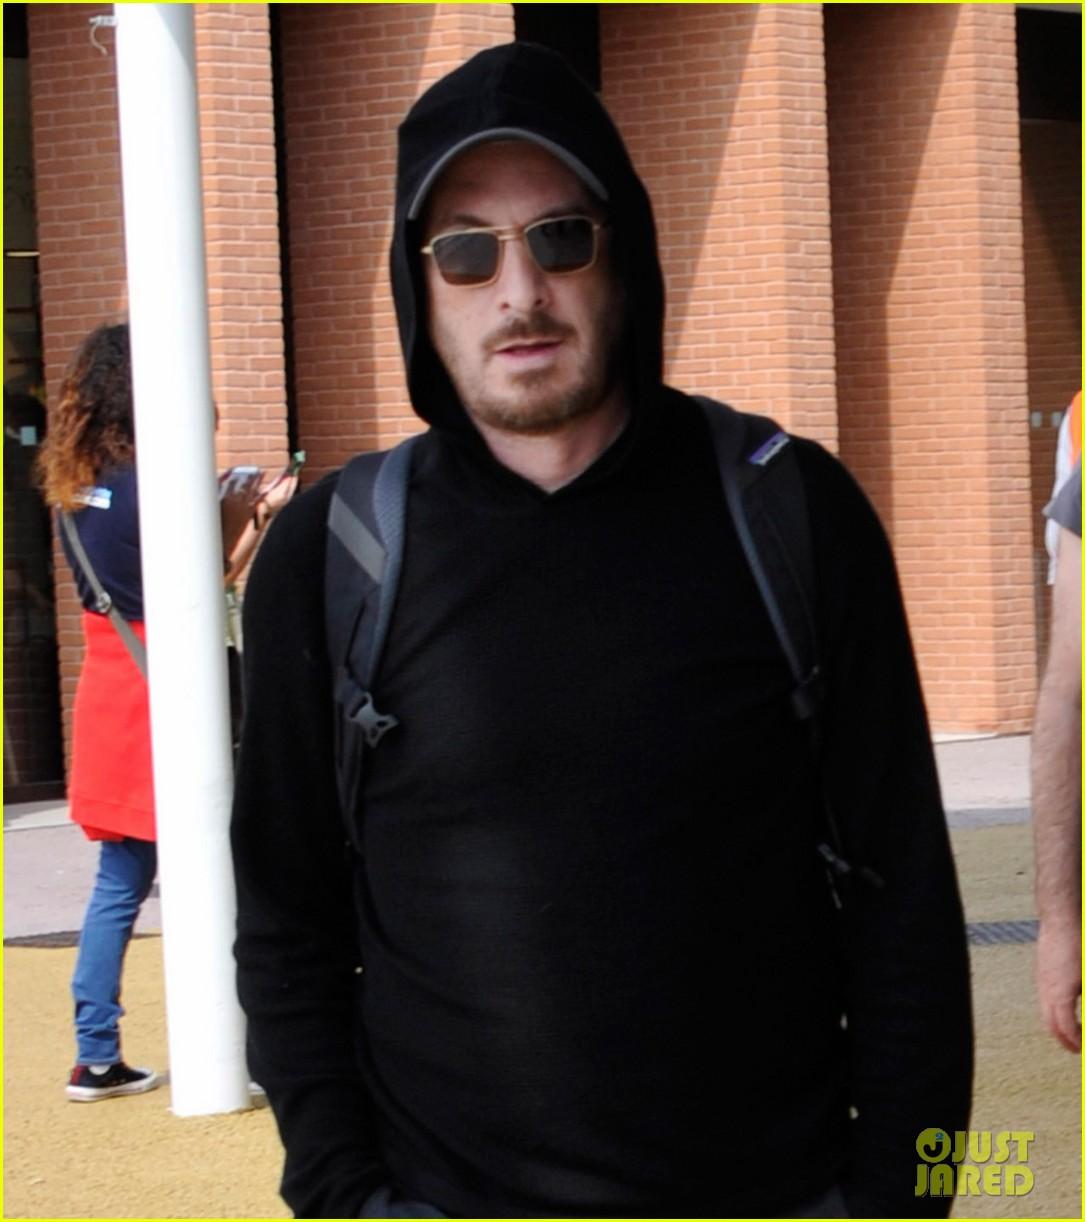 jennifer lawrence arrives for venice film festival with darren aronofsky 02